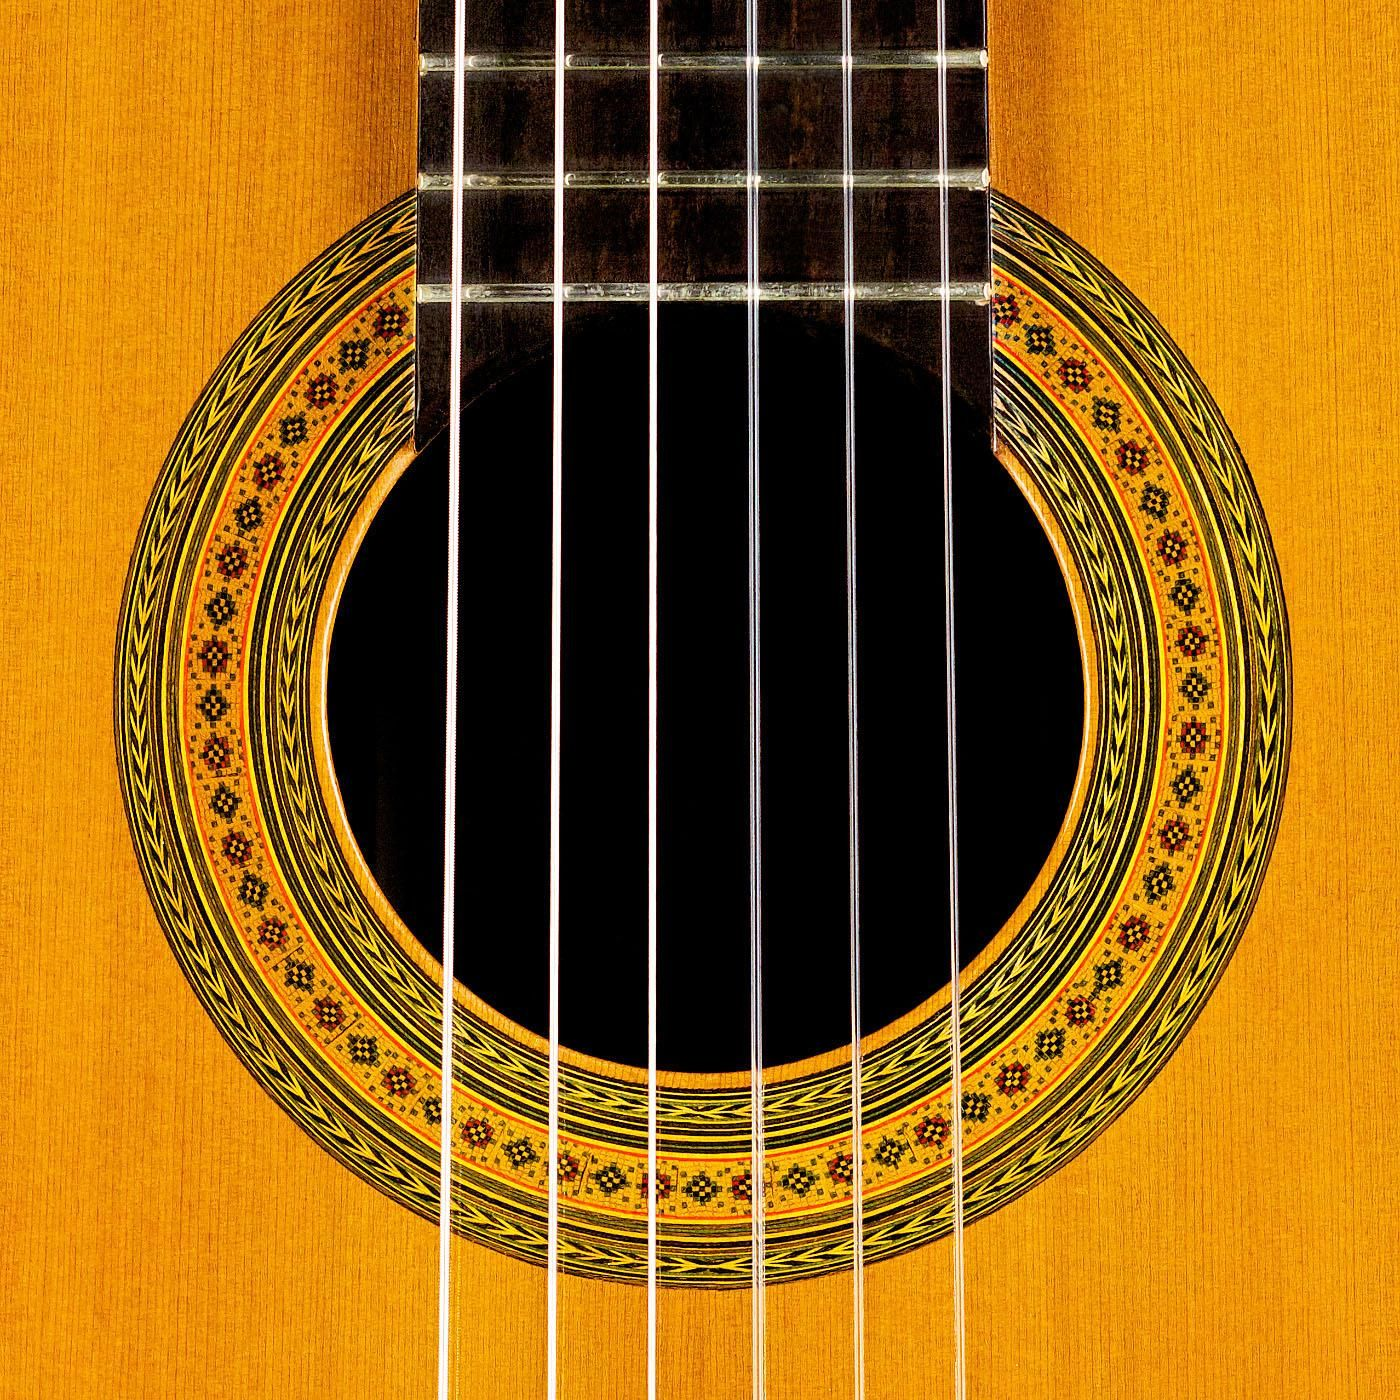 1975 Ignacio Fleta CD/IN - Guitar Salon International   Lutheria ...